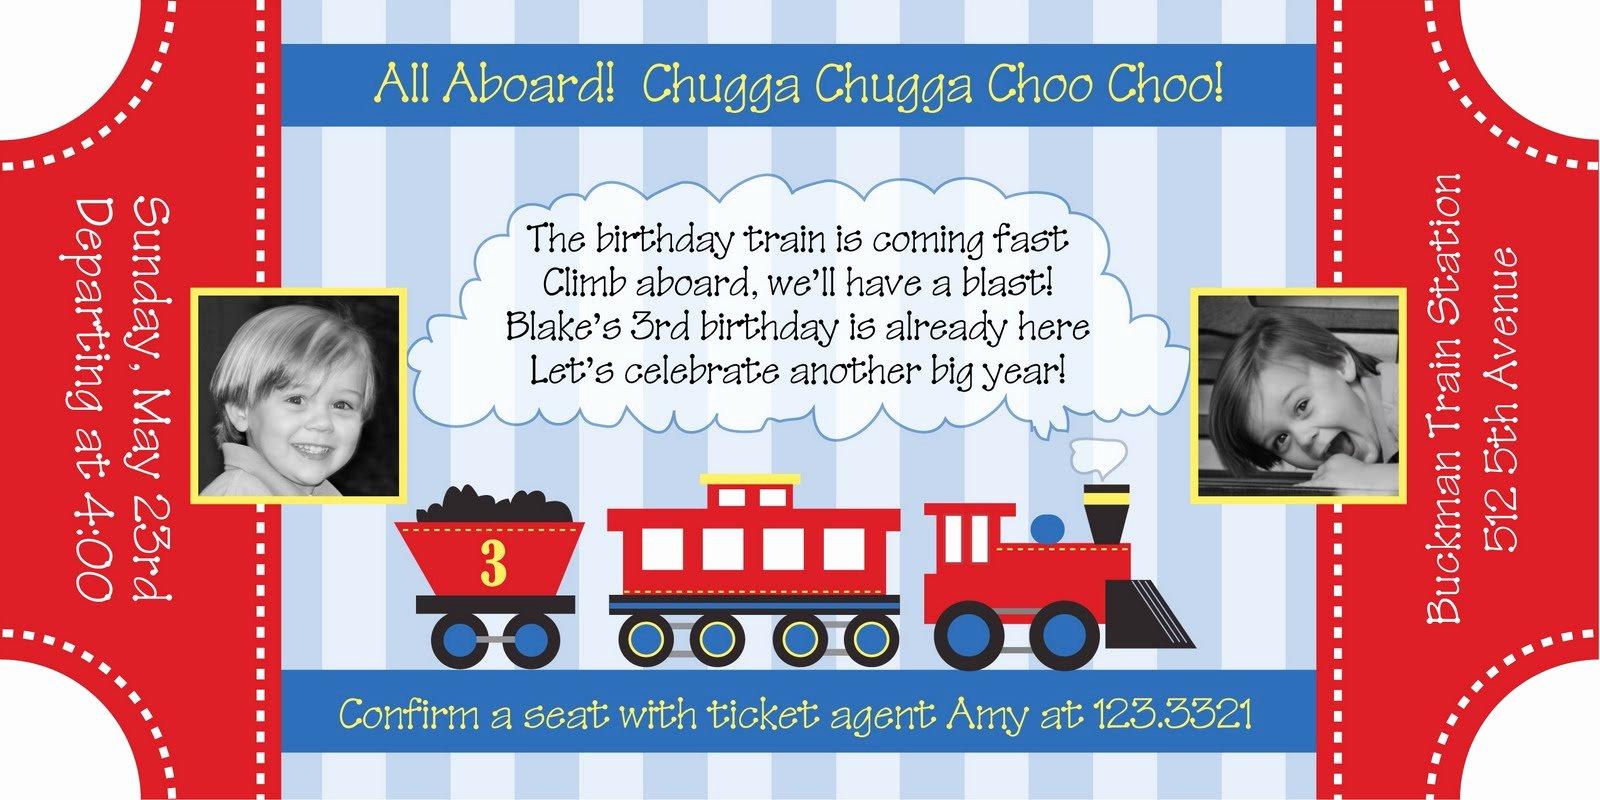 Train Ticket Template New All Aboard the Choo Choo Train Party anders Ruff Custom